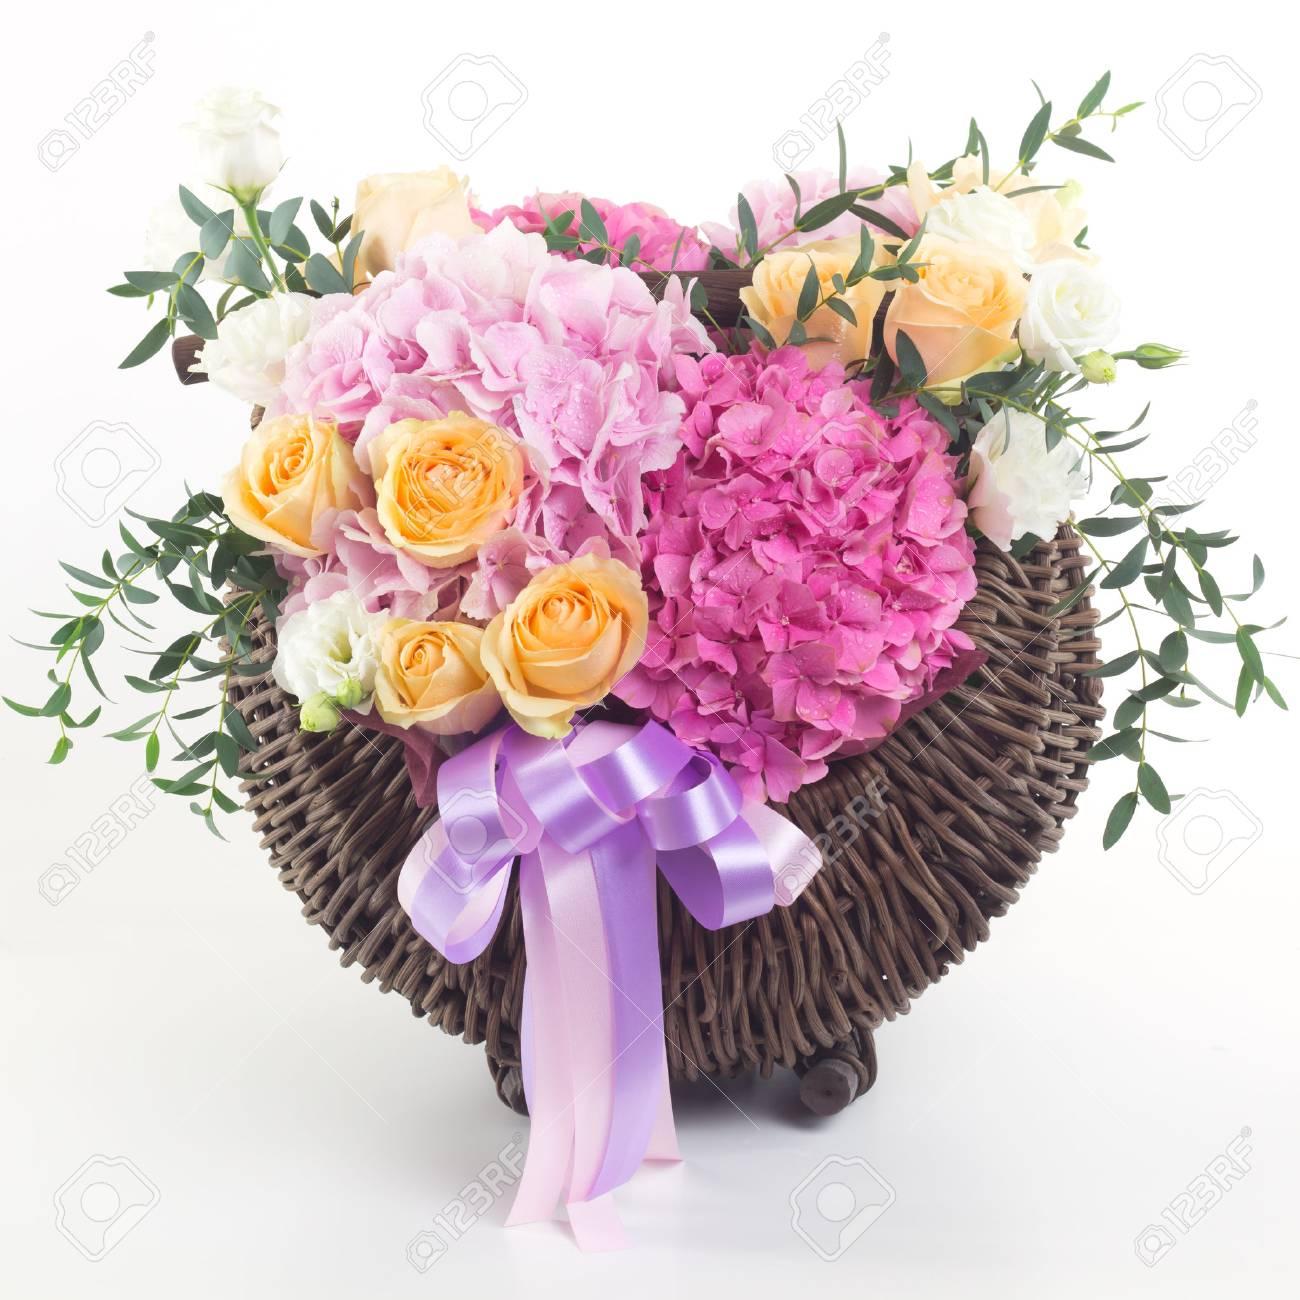 Beautiful flowers in basket isolated stock photo picture and beautiful flowers in basket isolated stock photo 44580101 izmirmasajfo